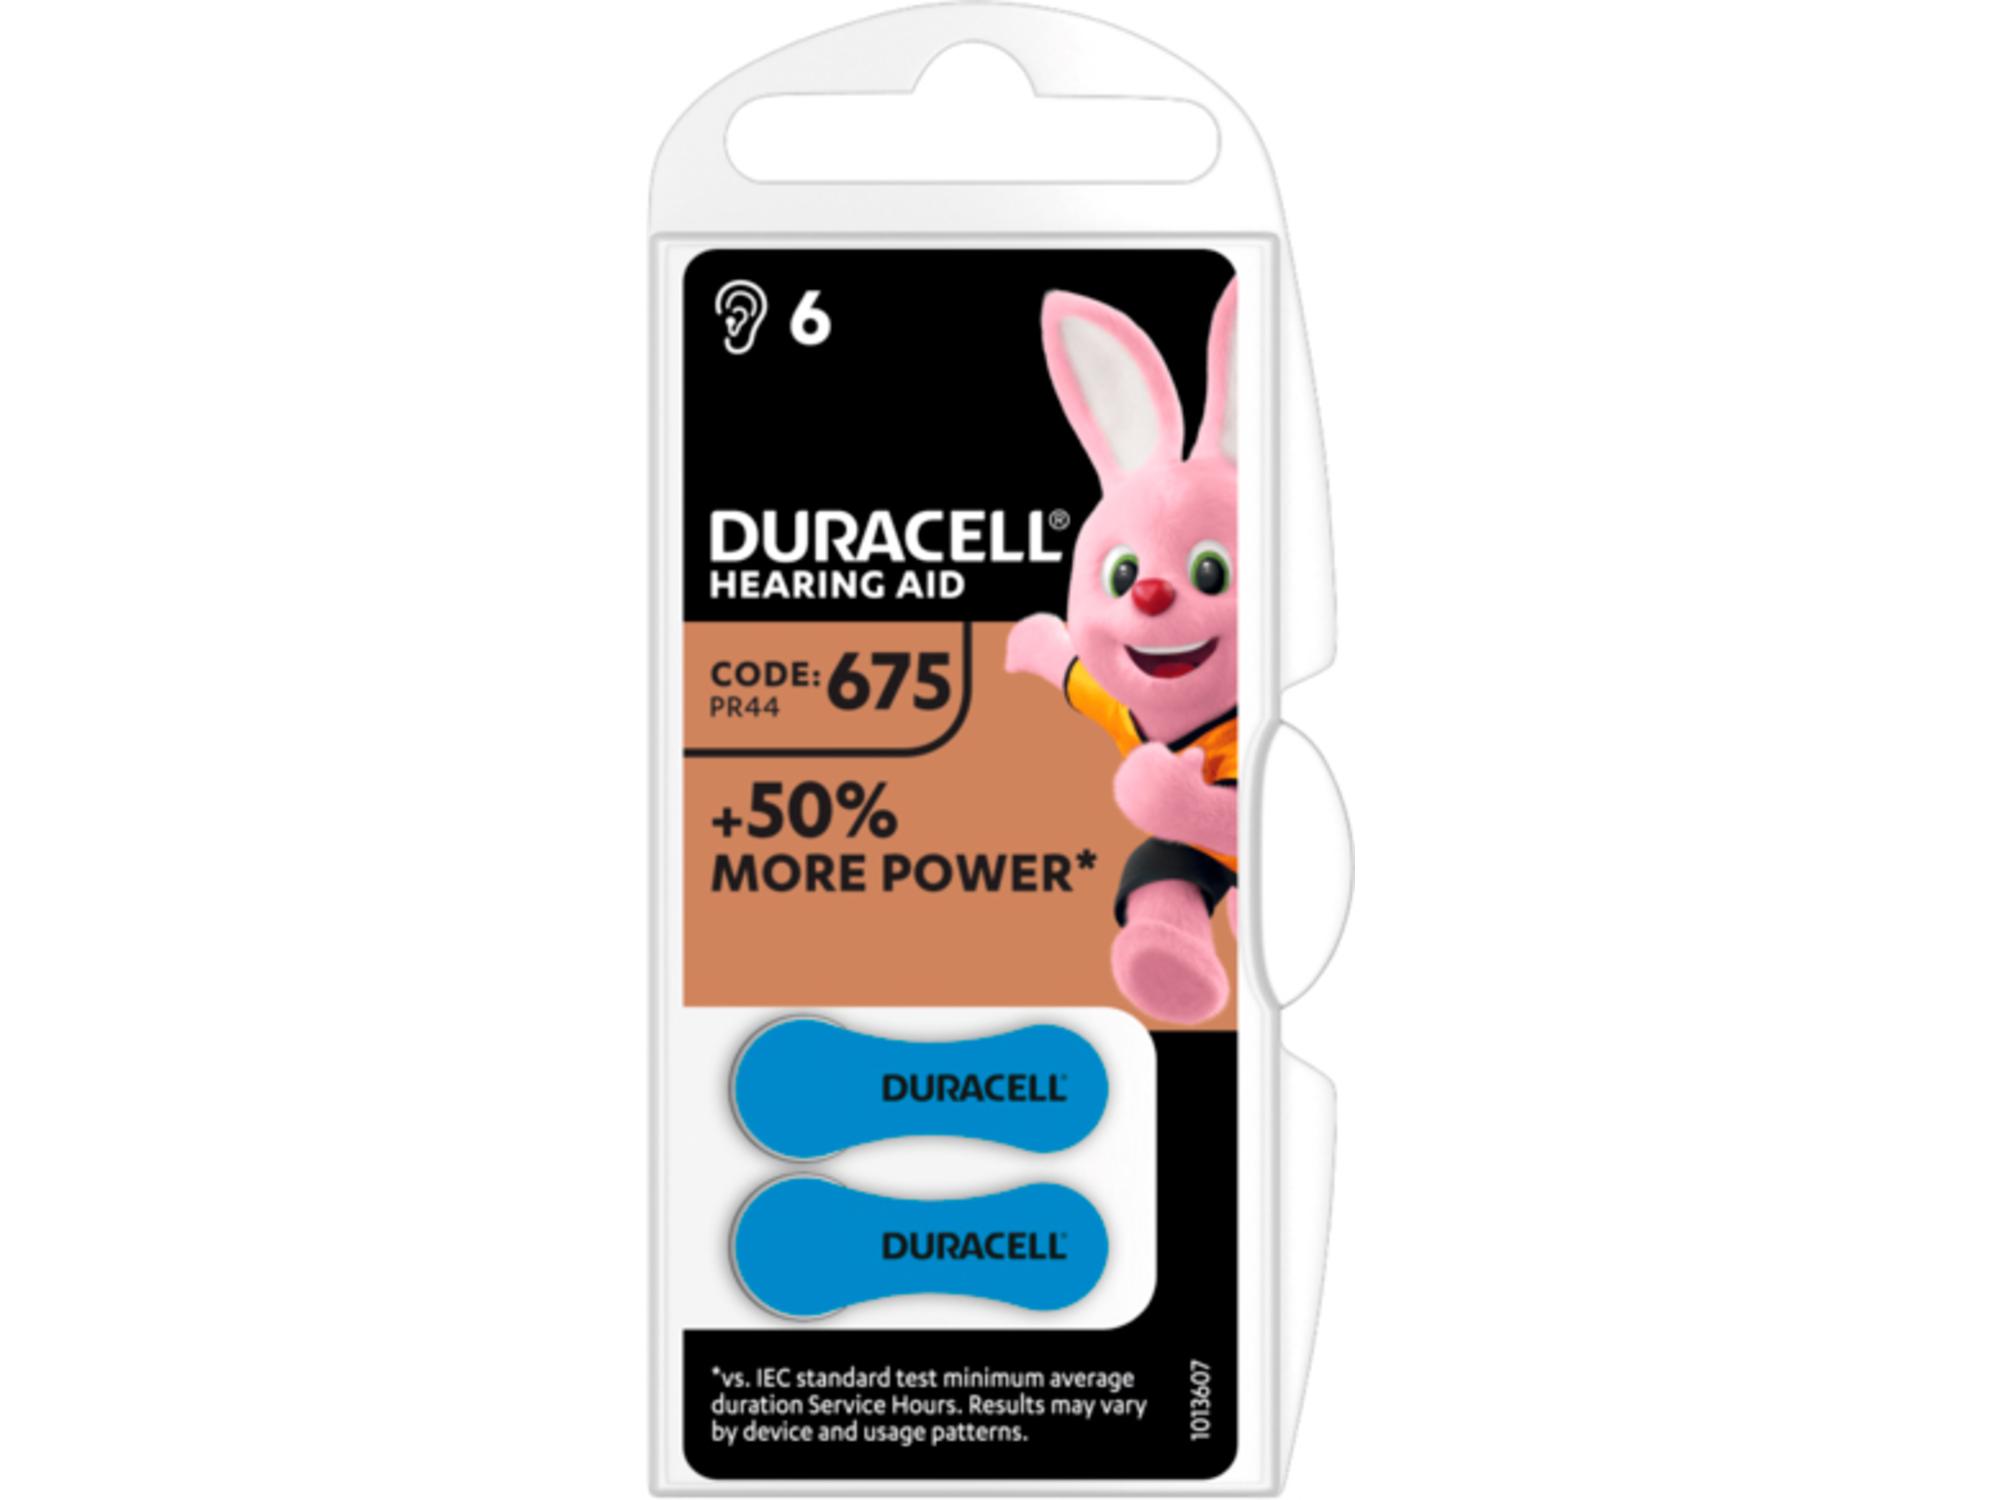 DURACELL baterije za slušne aparate Hearing Aid 675 B6